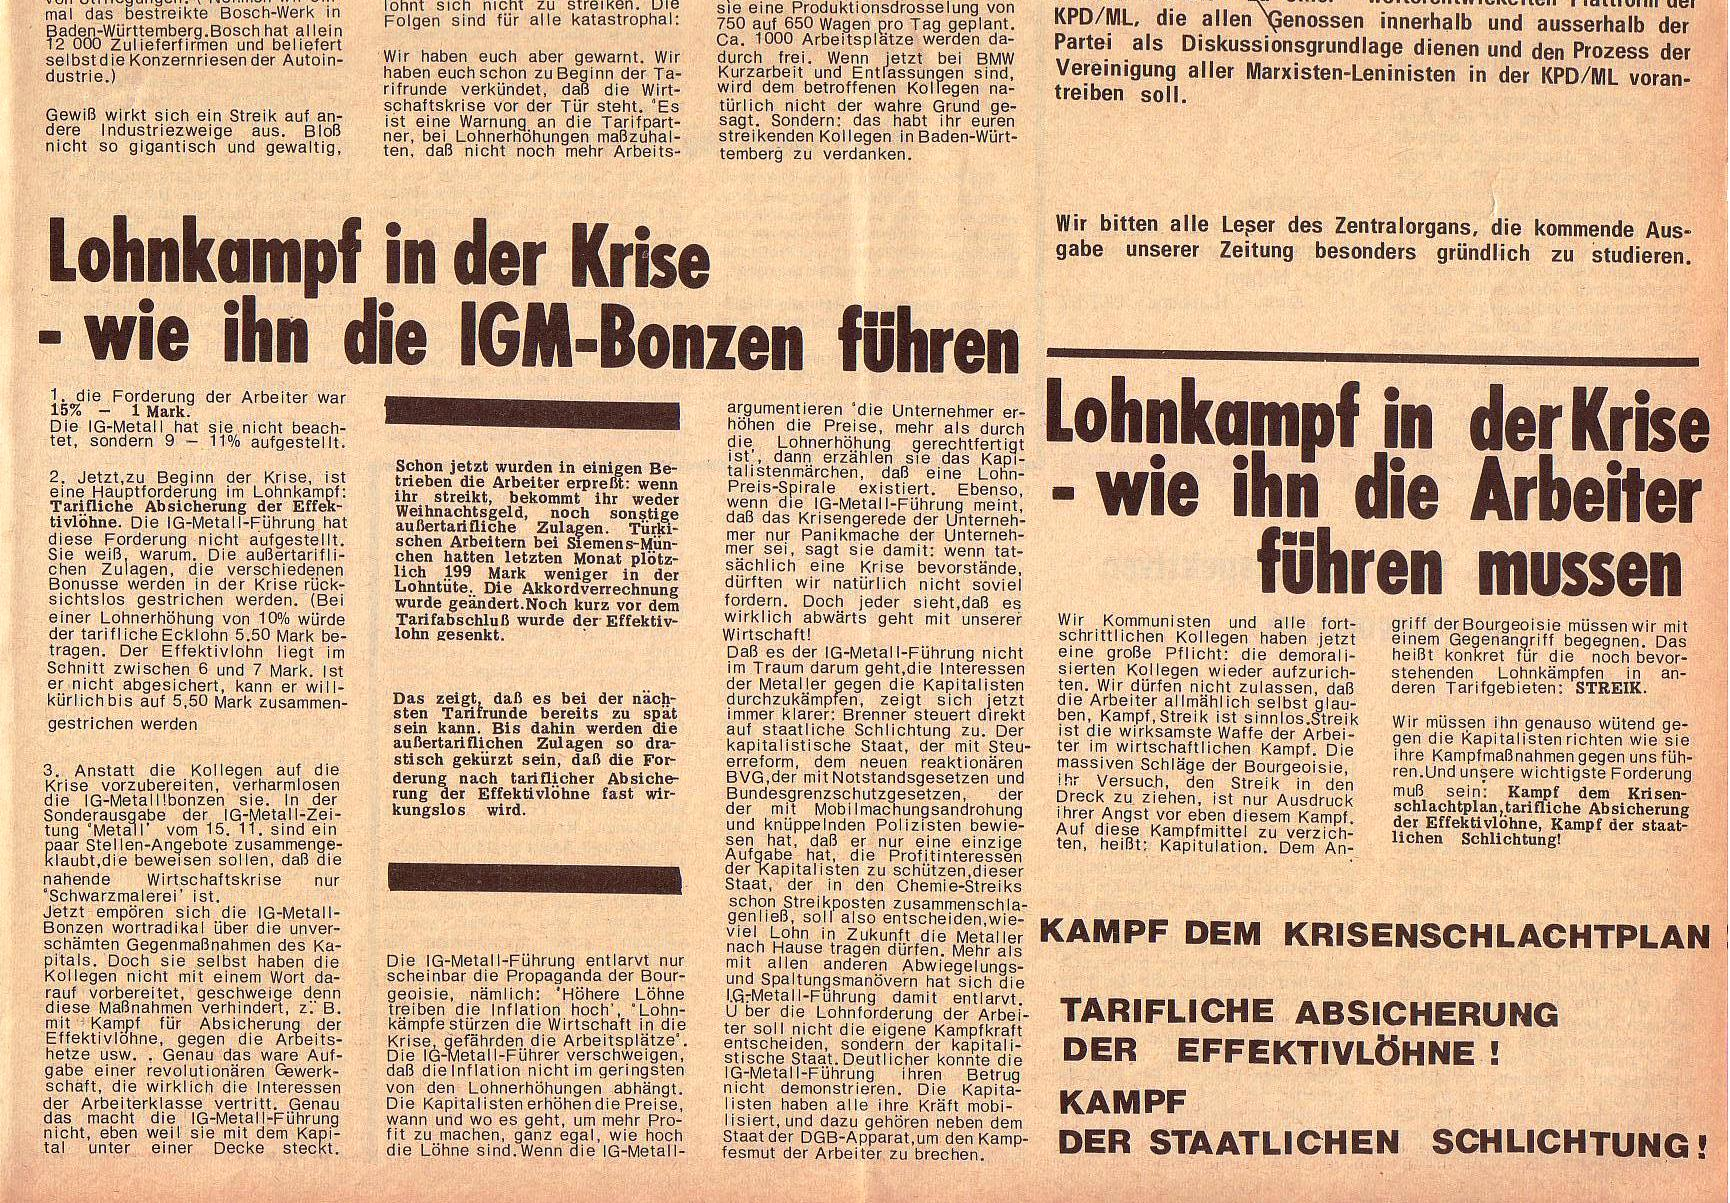 Roter Morgen, 5. Jg., 6. Dezember 1971, Nr. 15, Seite 7b